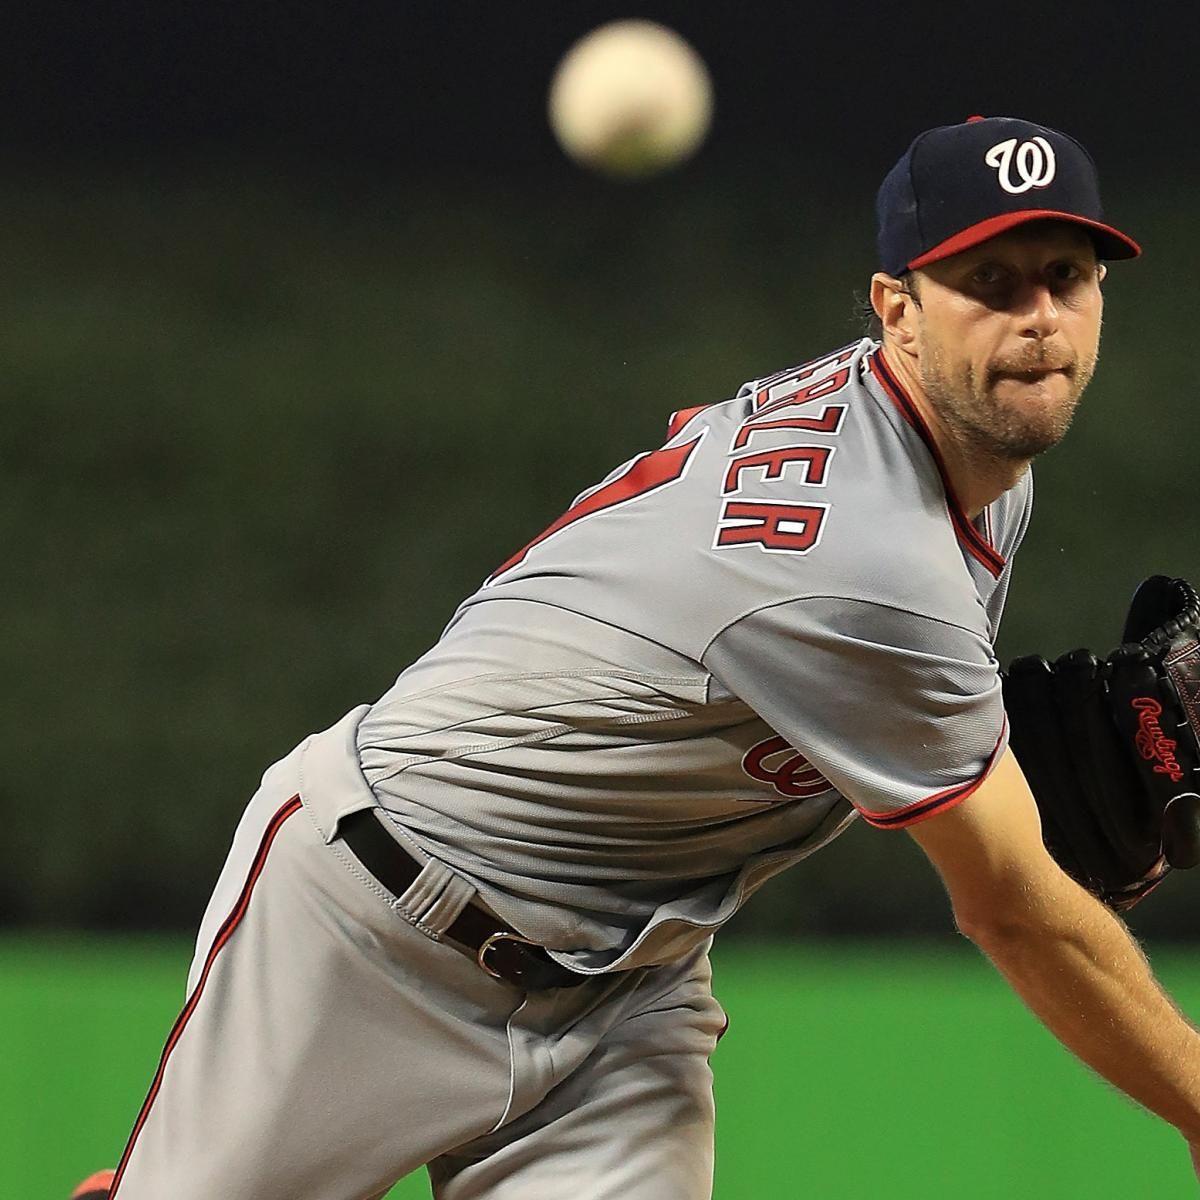 210M Ace Max Scherzer Has Passed Clayton Kershaw As MLB's No 1